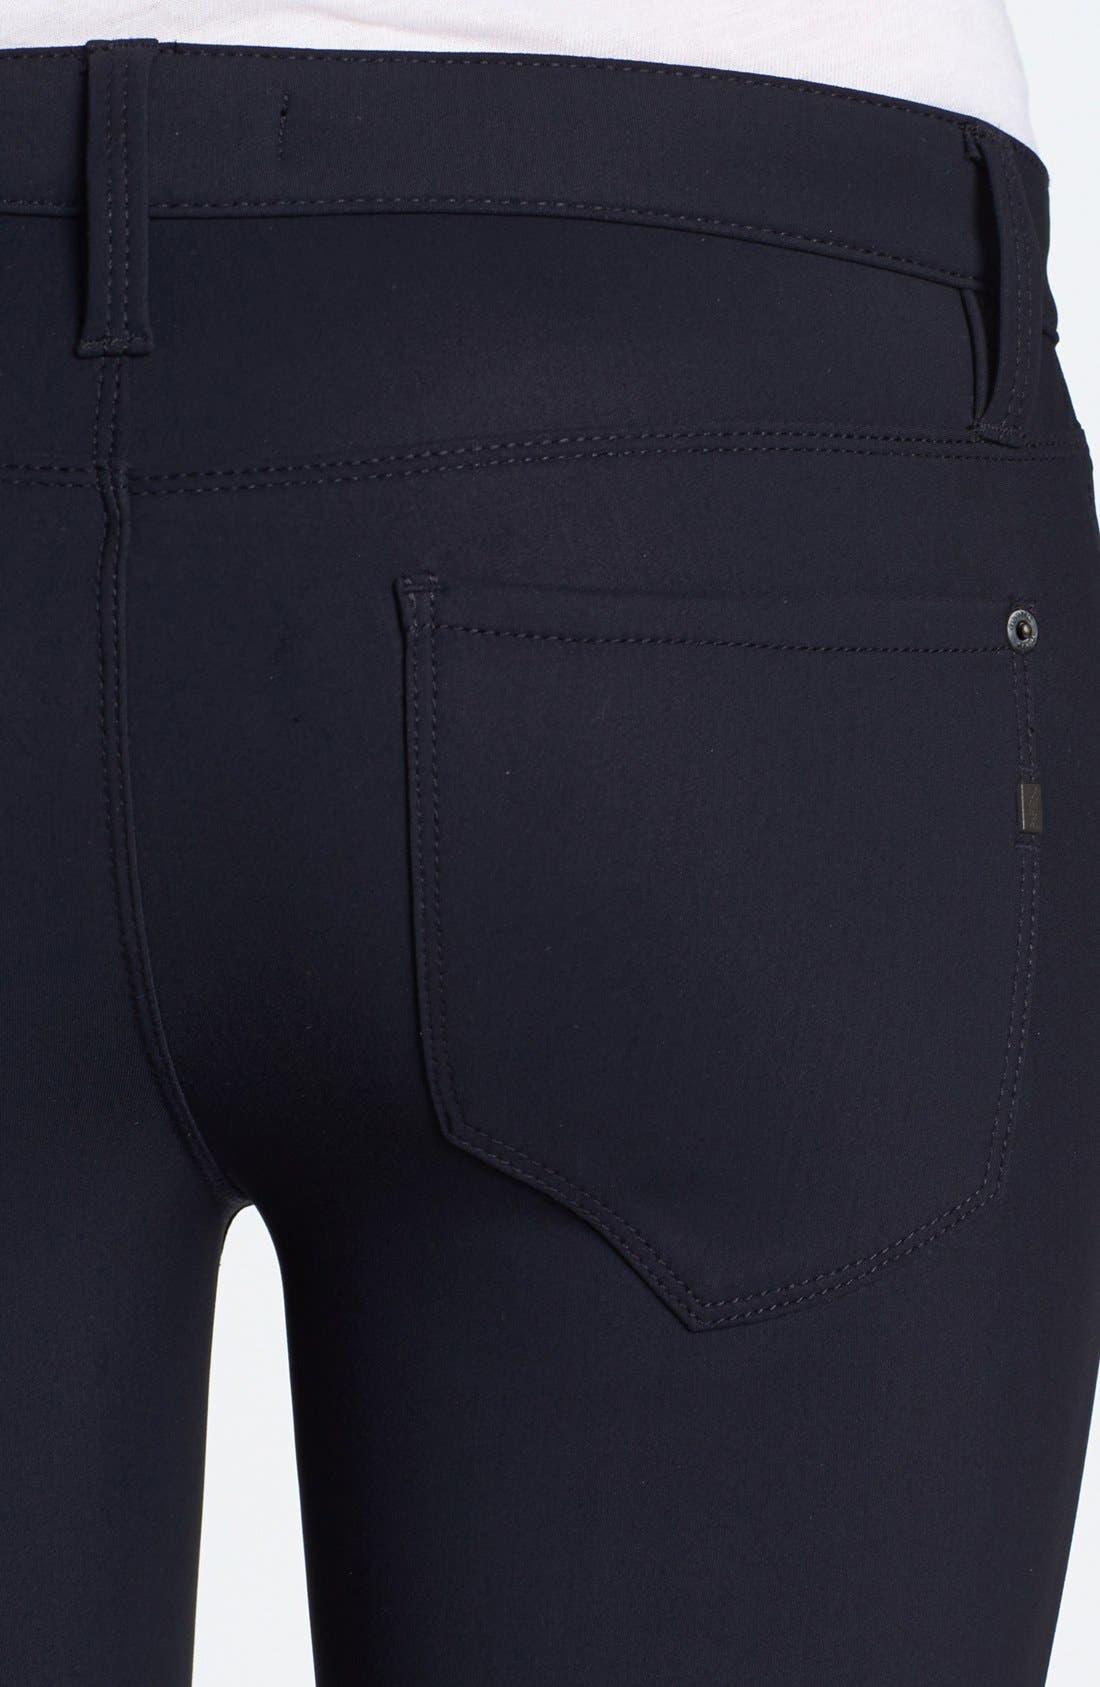 Alternate Image 3  - Genetic 'James' Neoprene Cigarette Jeans (Jet)